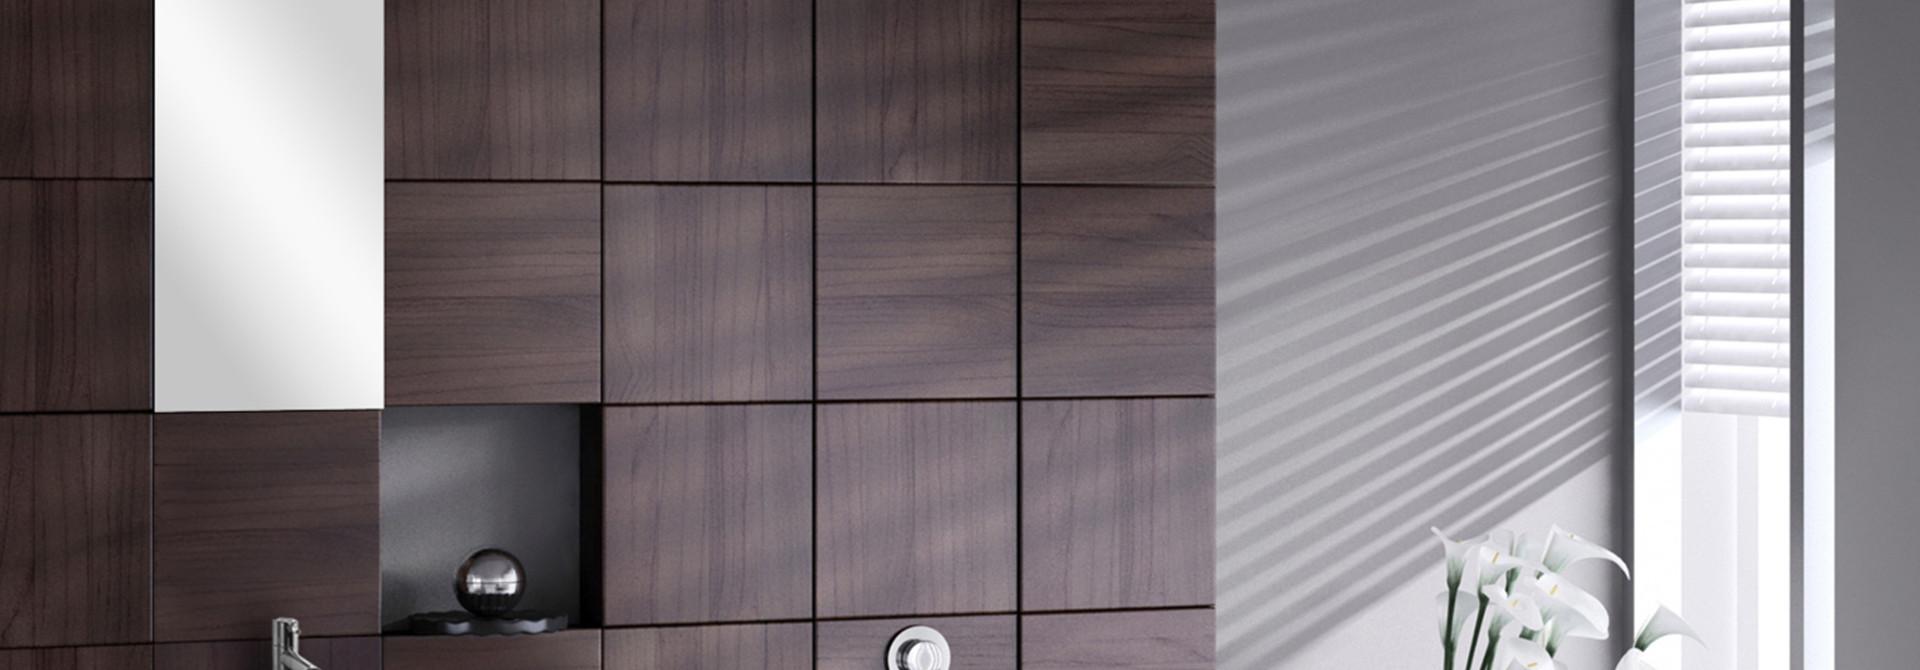 Flat Small fontein – Keramiek wit 24 x 38 x 7 cm